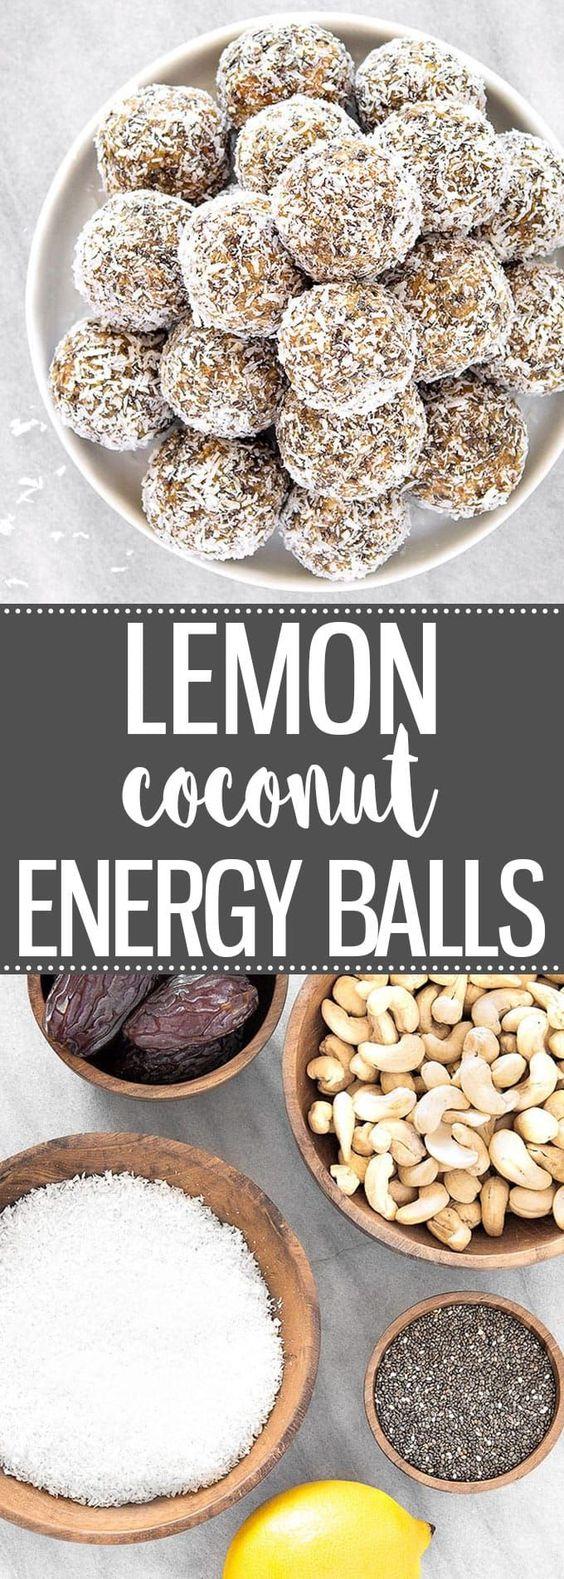 HEALTHY LEMON COCONUT ENERGY BALLS #lemon #coconut #energyballs #healthysnack #healthyfood #healthyrecipes #snackrecipes #easysnackrecipes